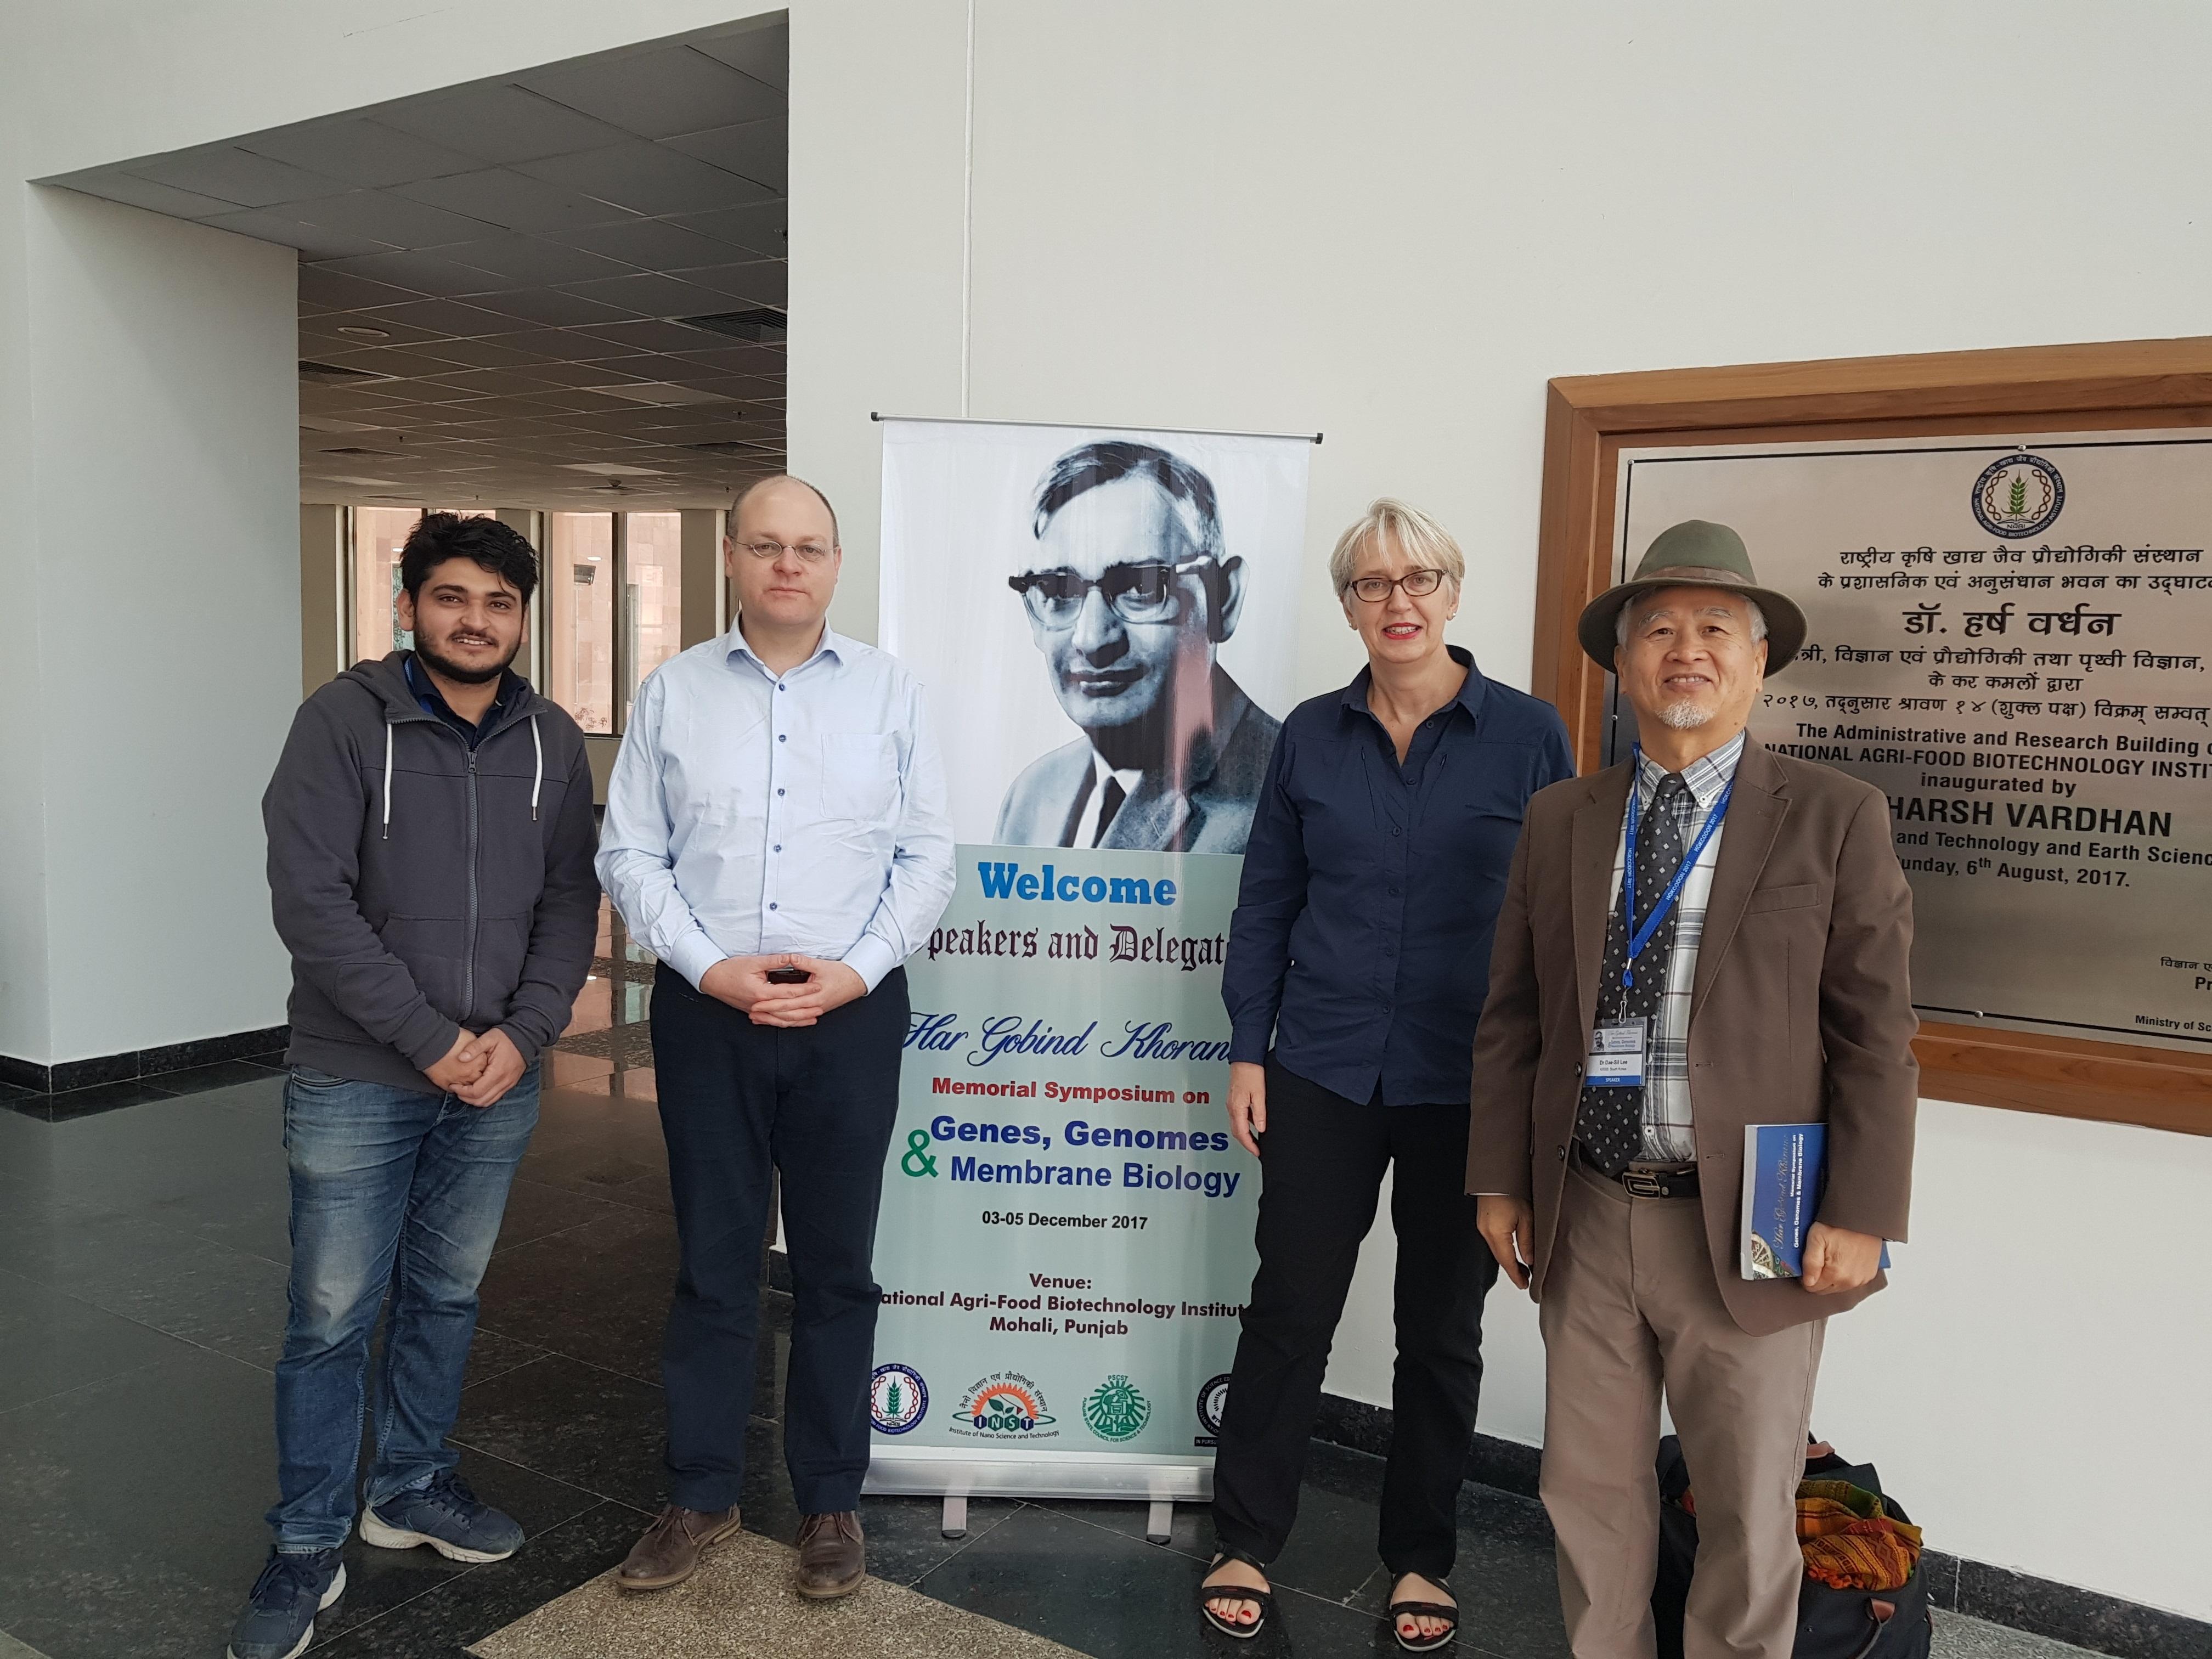 Khorana Symposium 2